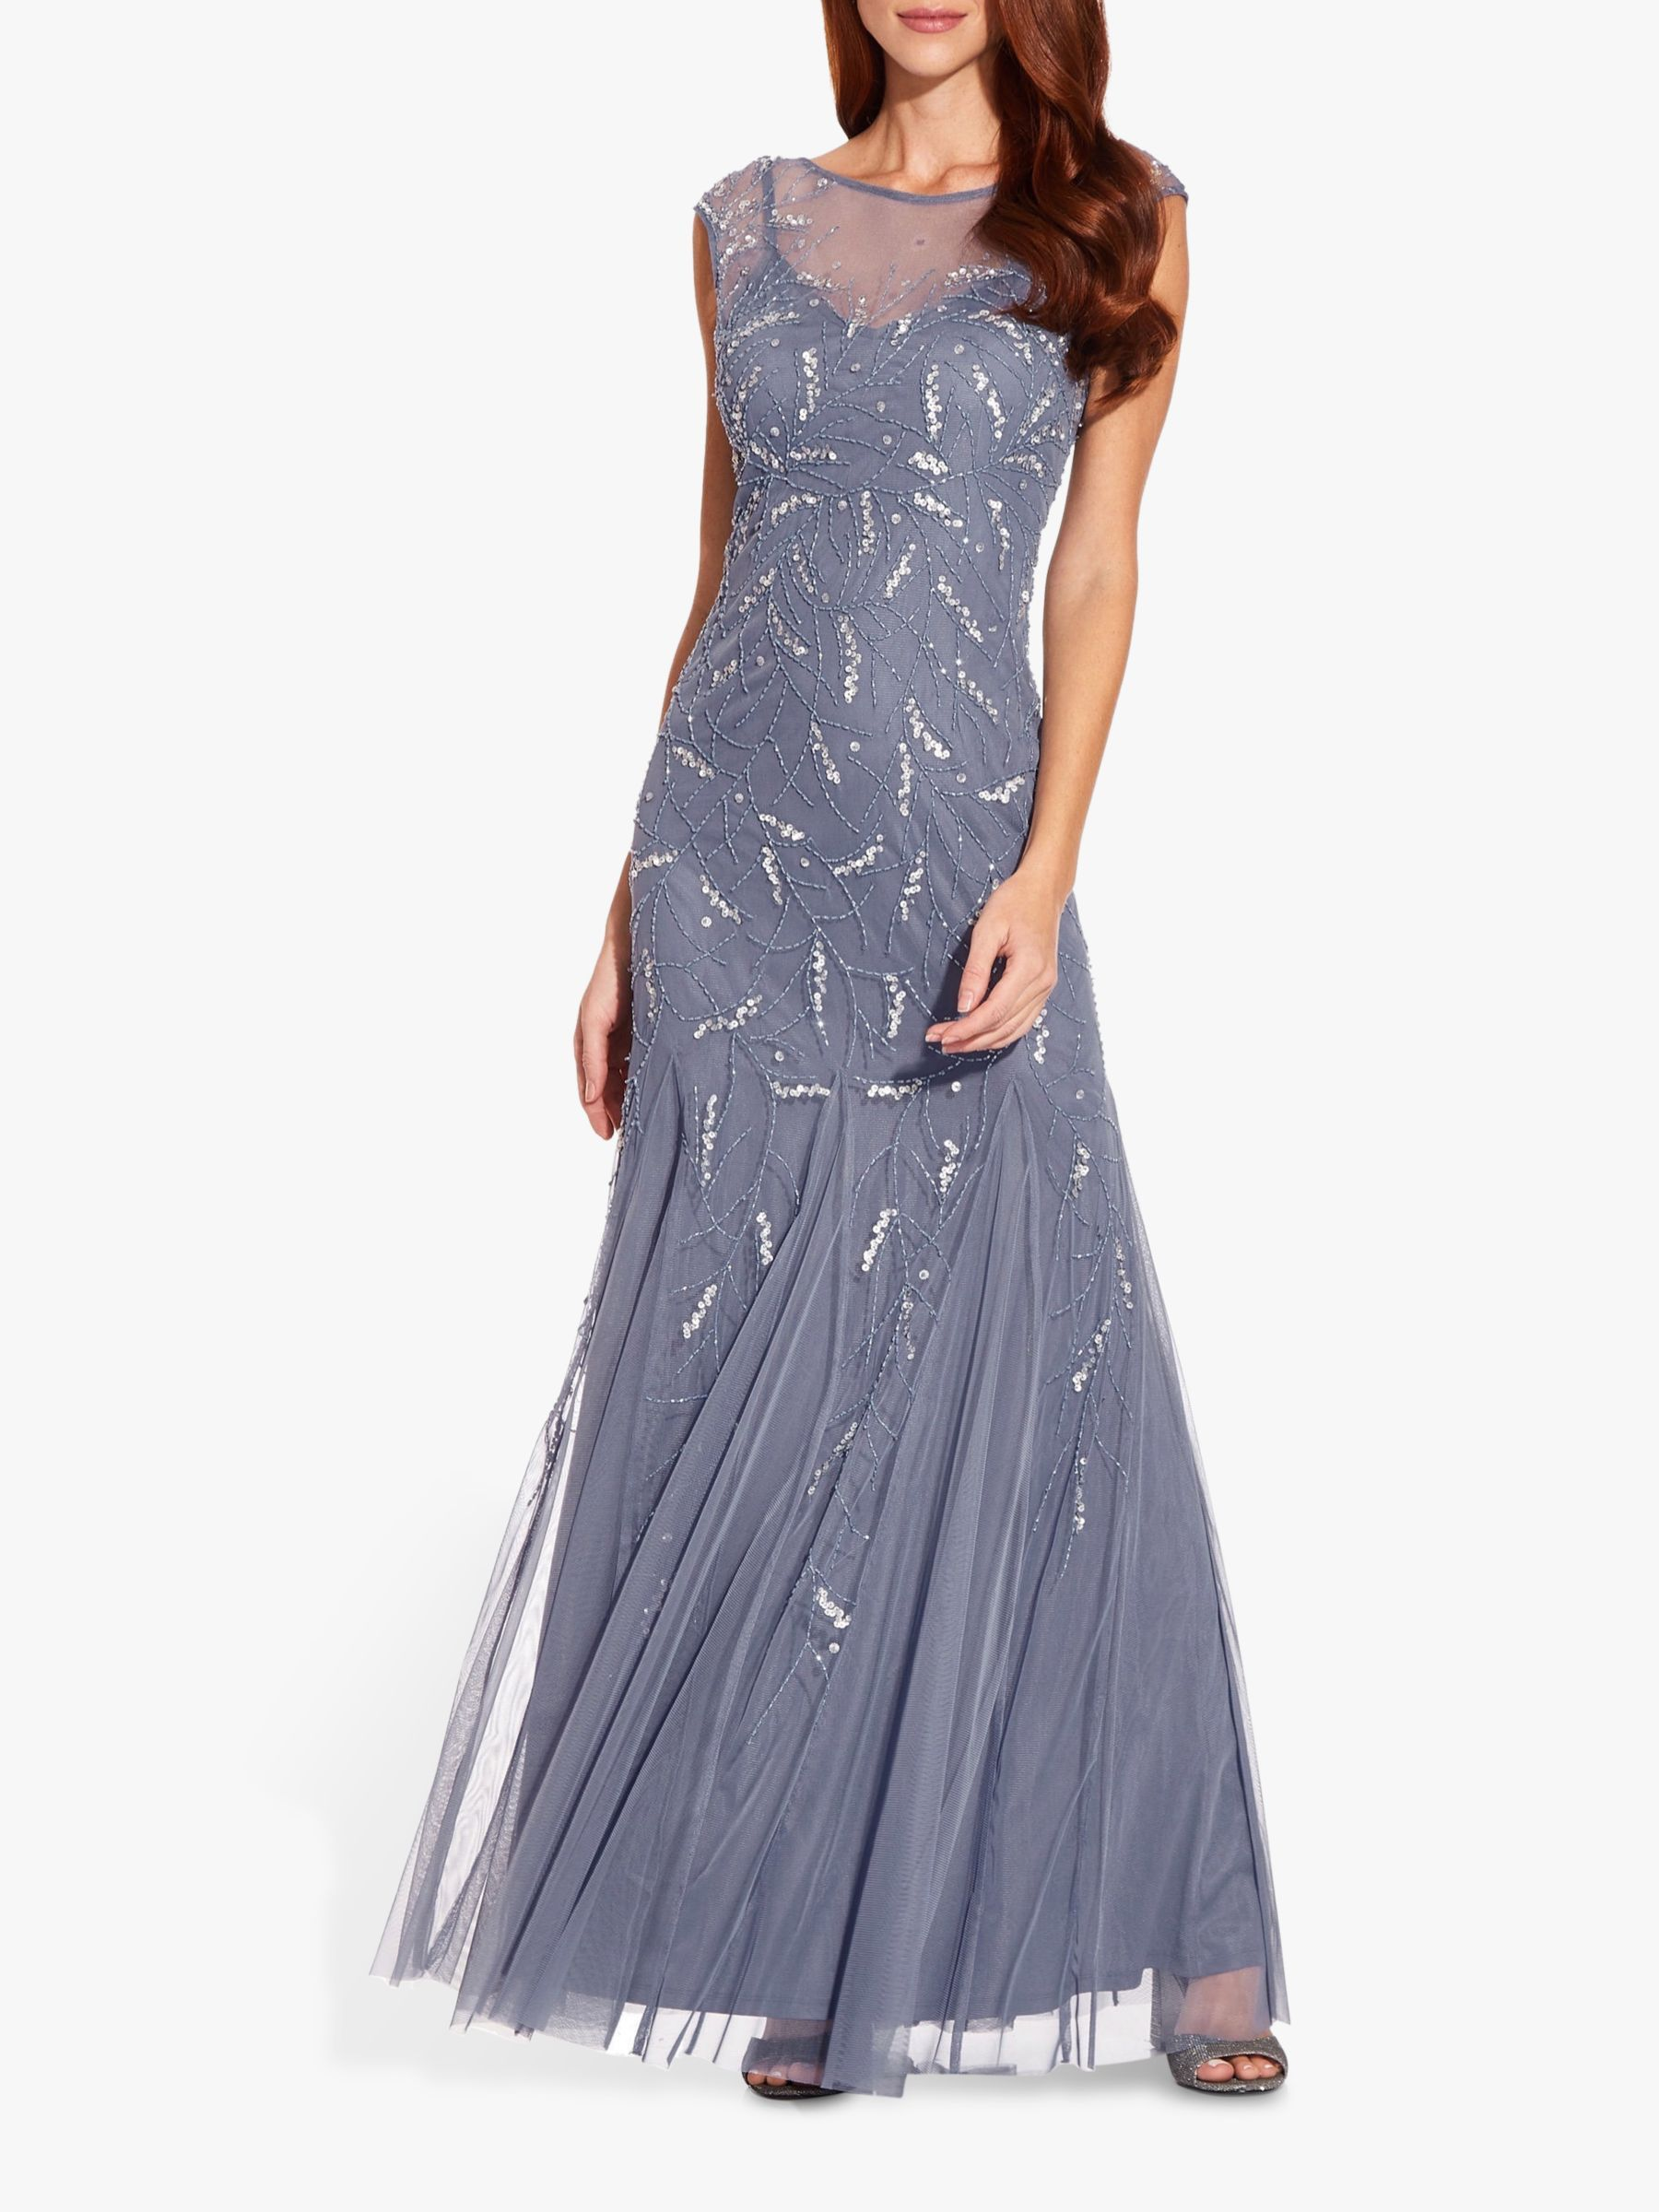 Aidan Mattox Popover Sequin Bodice Sleeveless Formal Evening Gown Dress